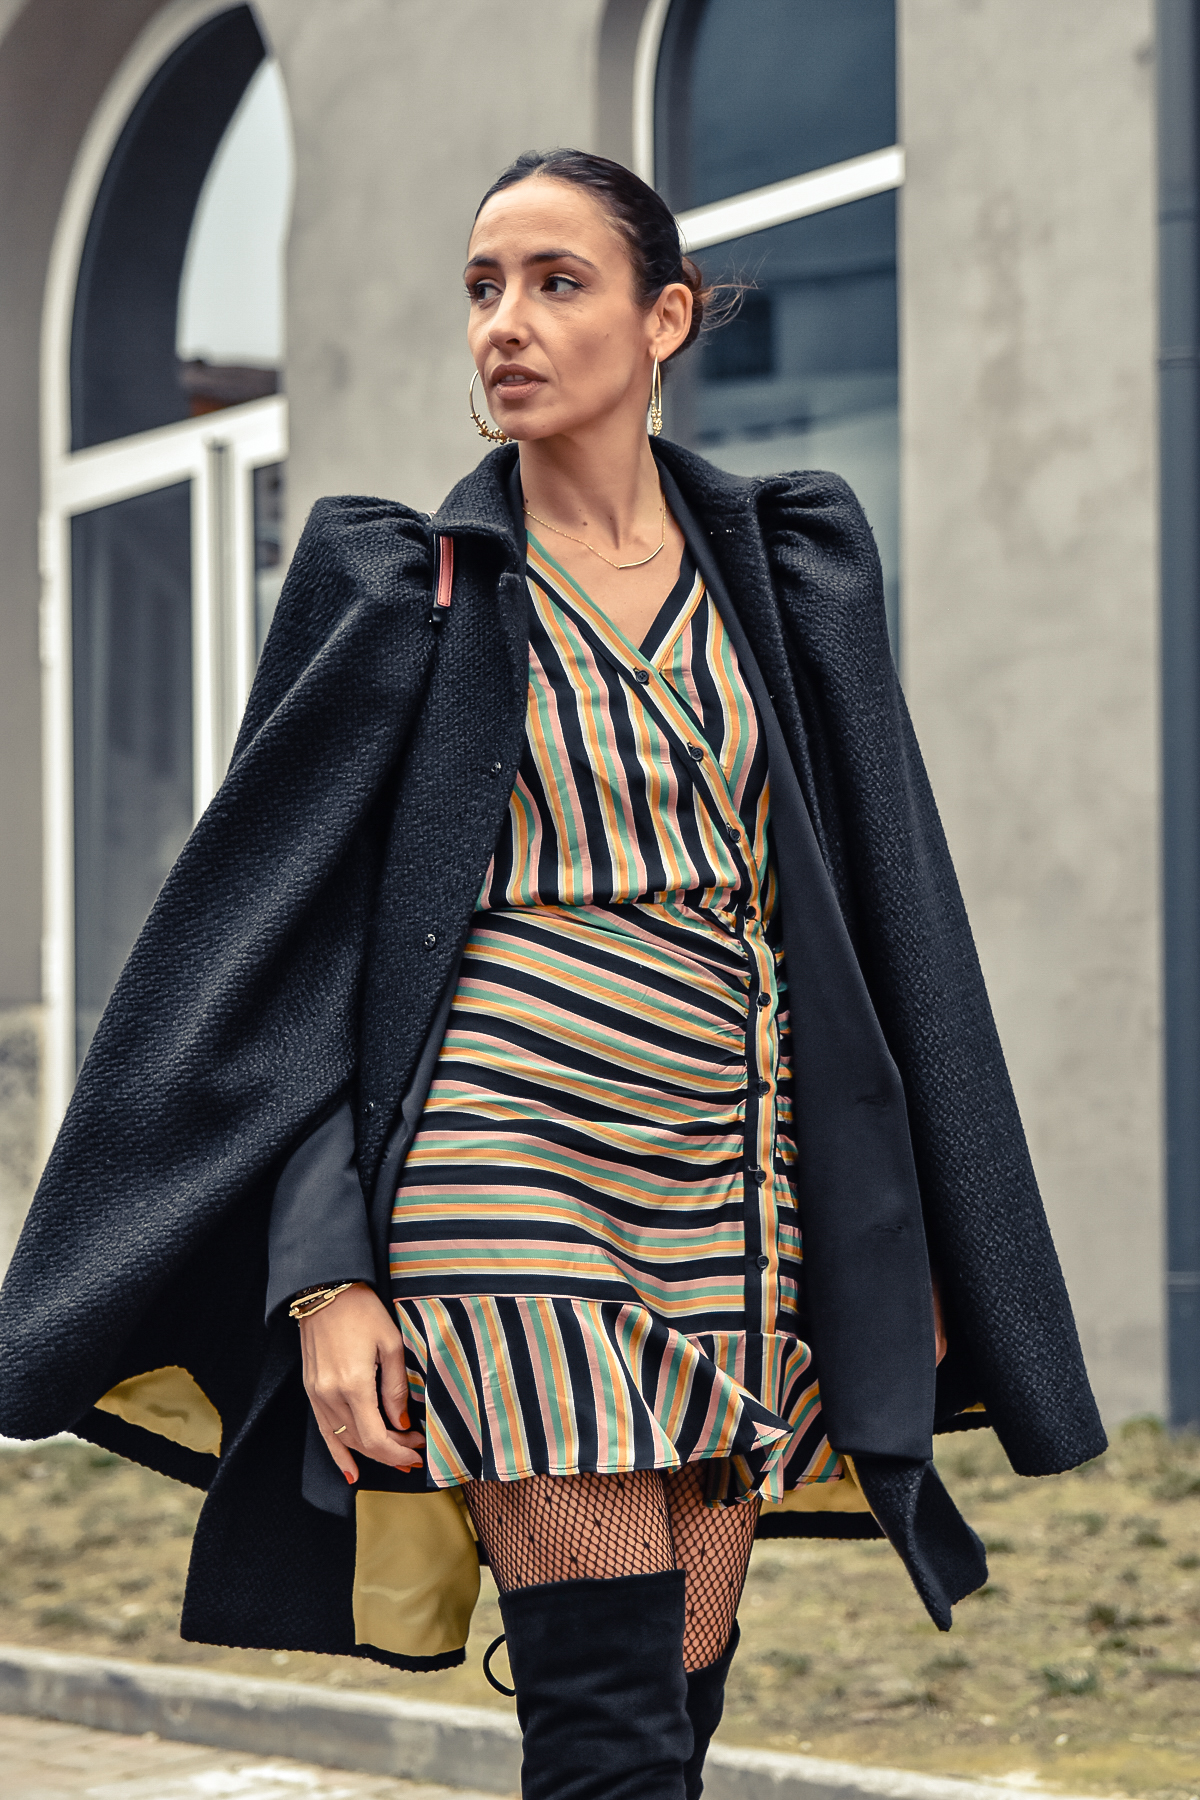 el-blog-de-silvia-fashion-blogger-street-style-mfw-vestido-rayas-01